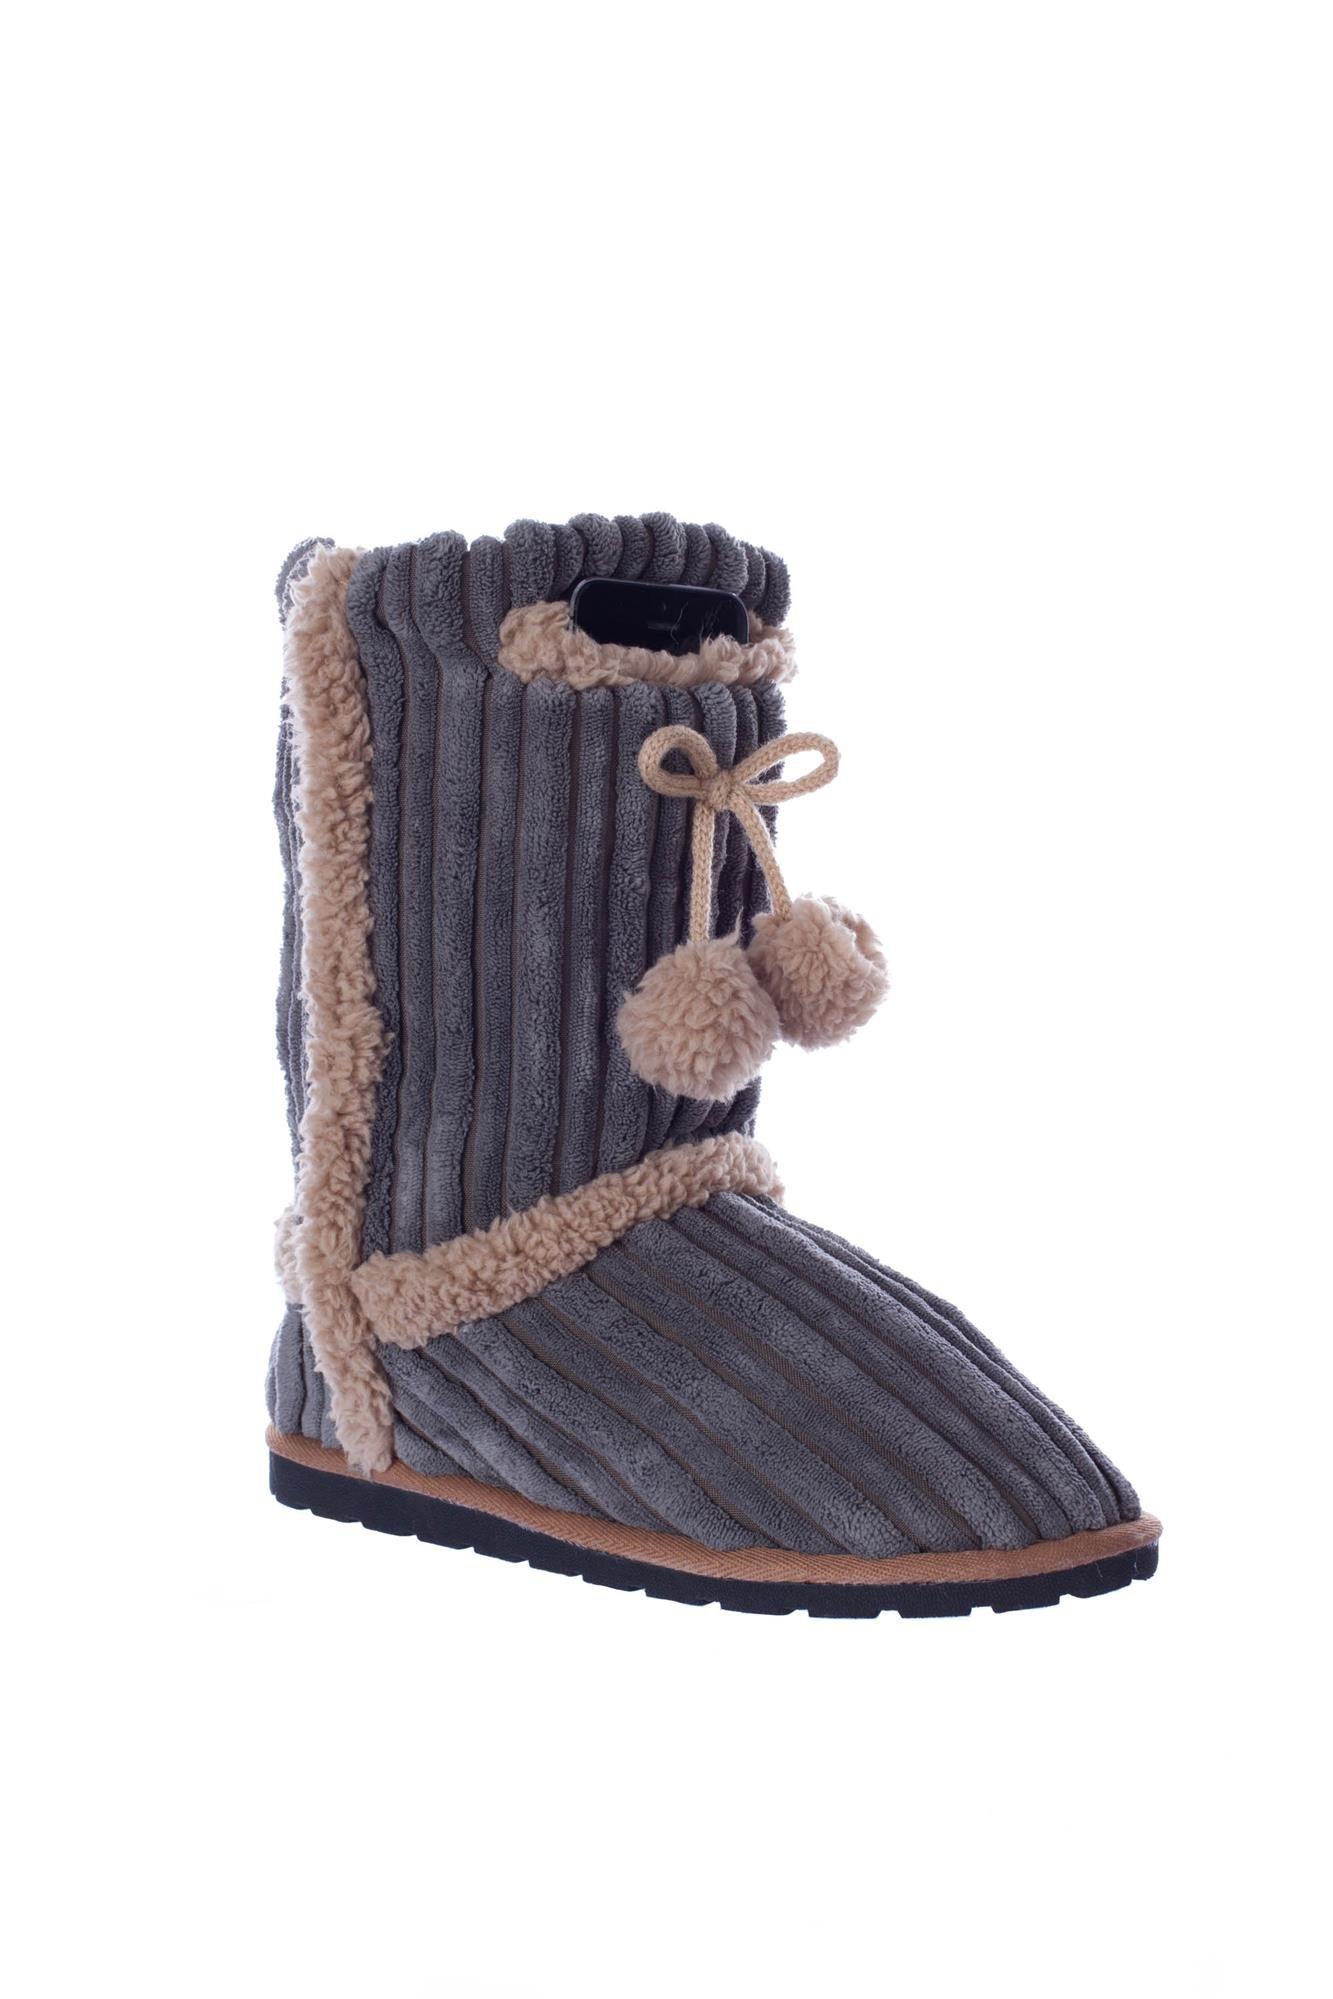 Outdoor Fuzzy Slipper Socks Boot Hard Bottom Phone Pocket CGrey Cord Large